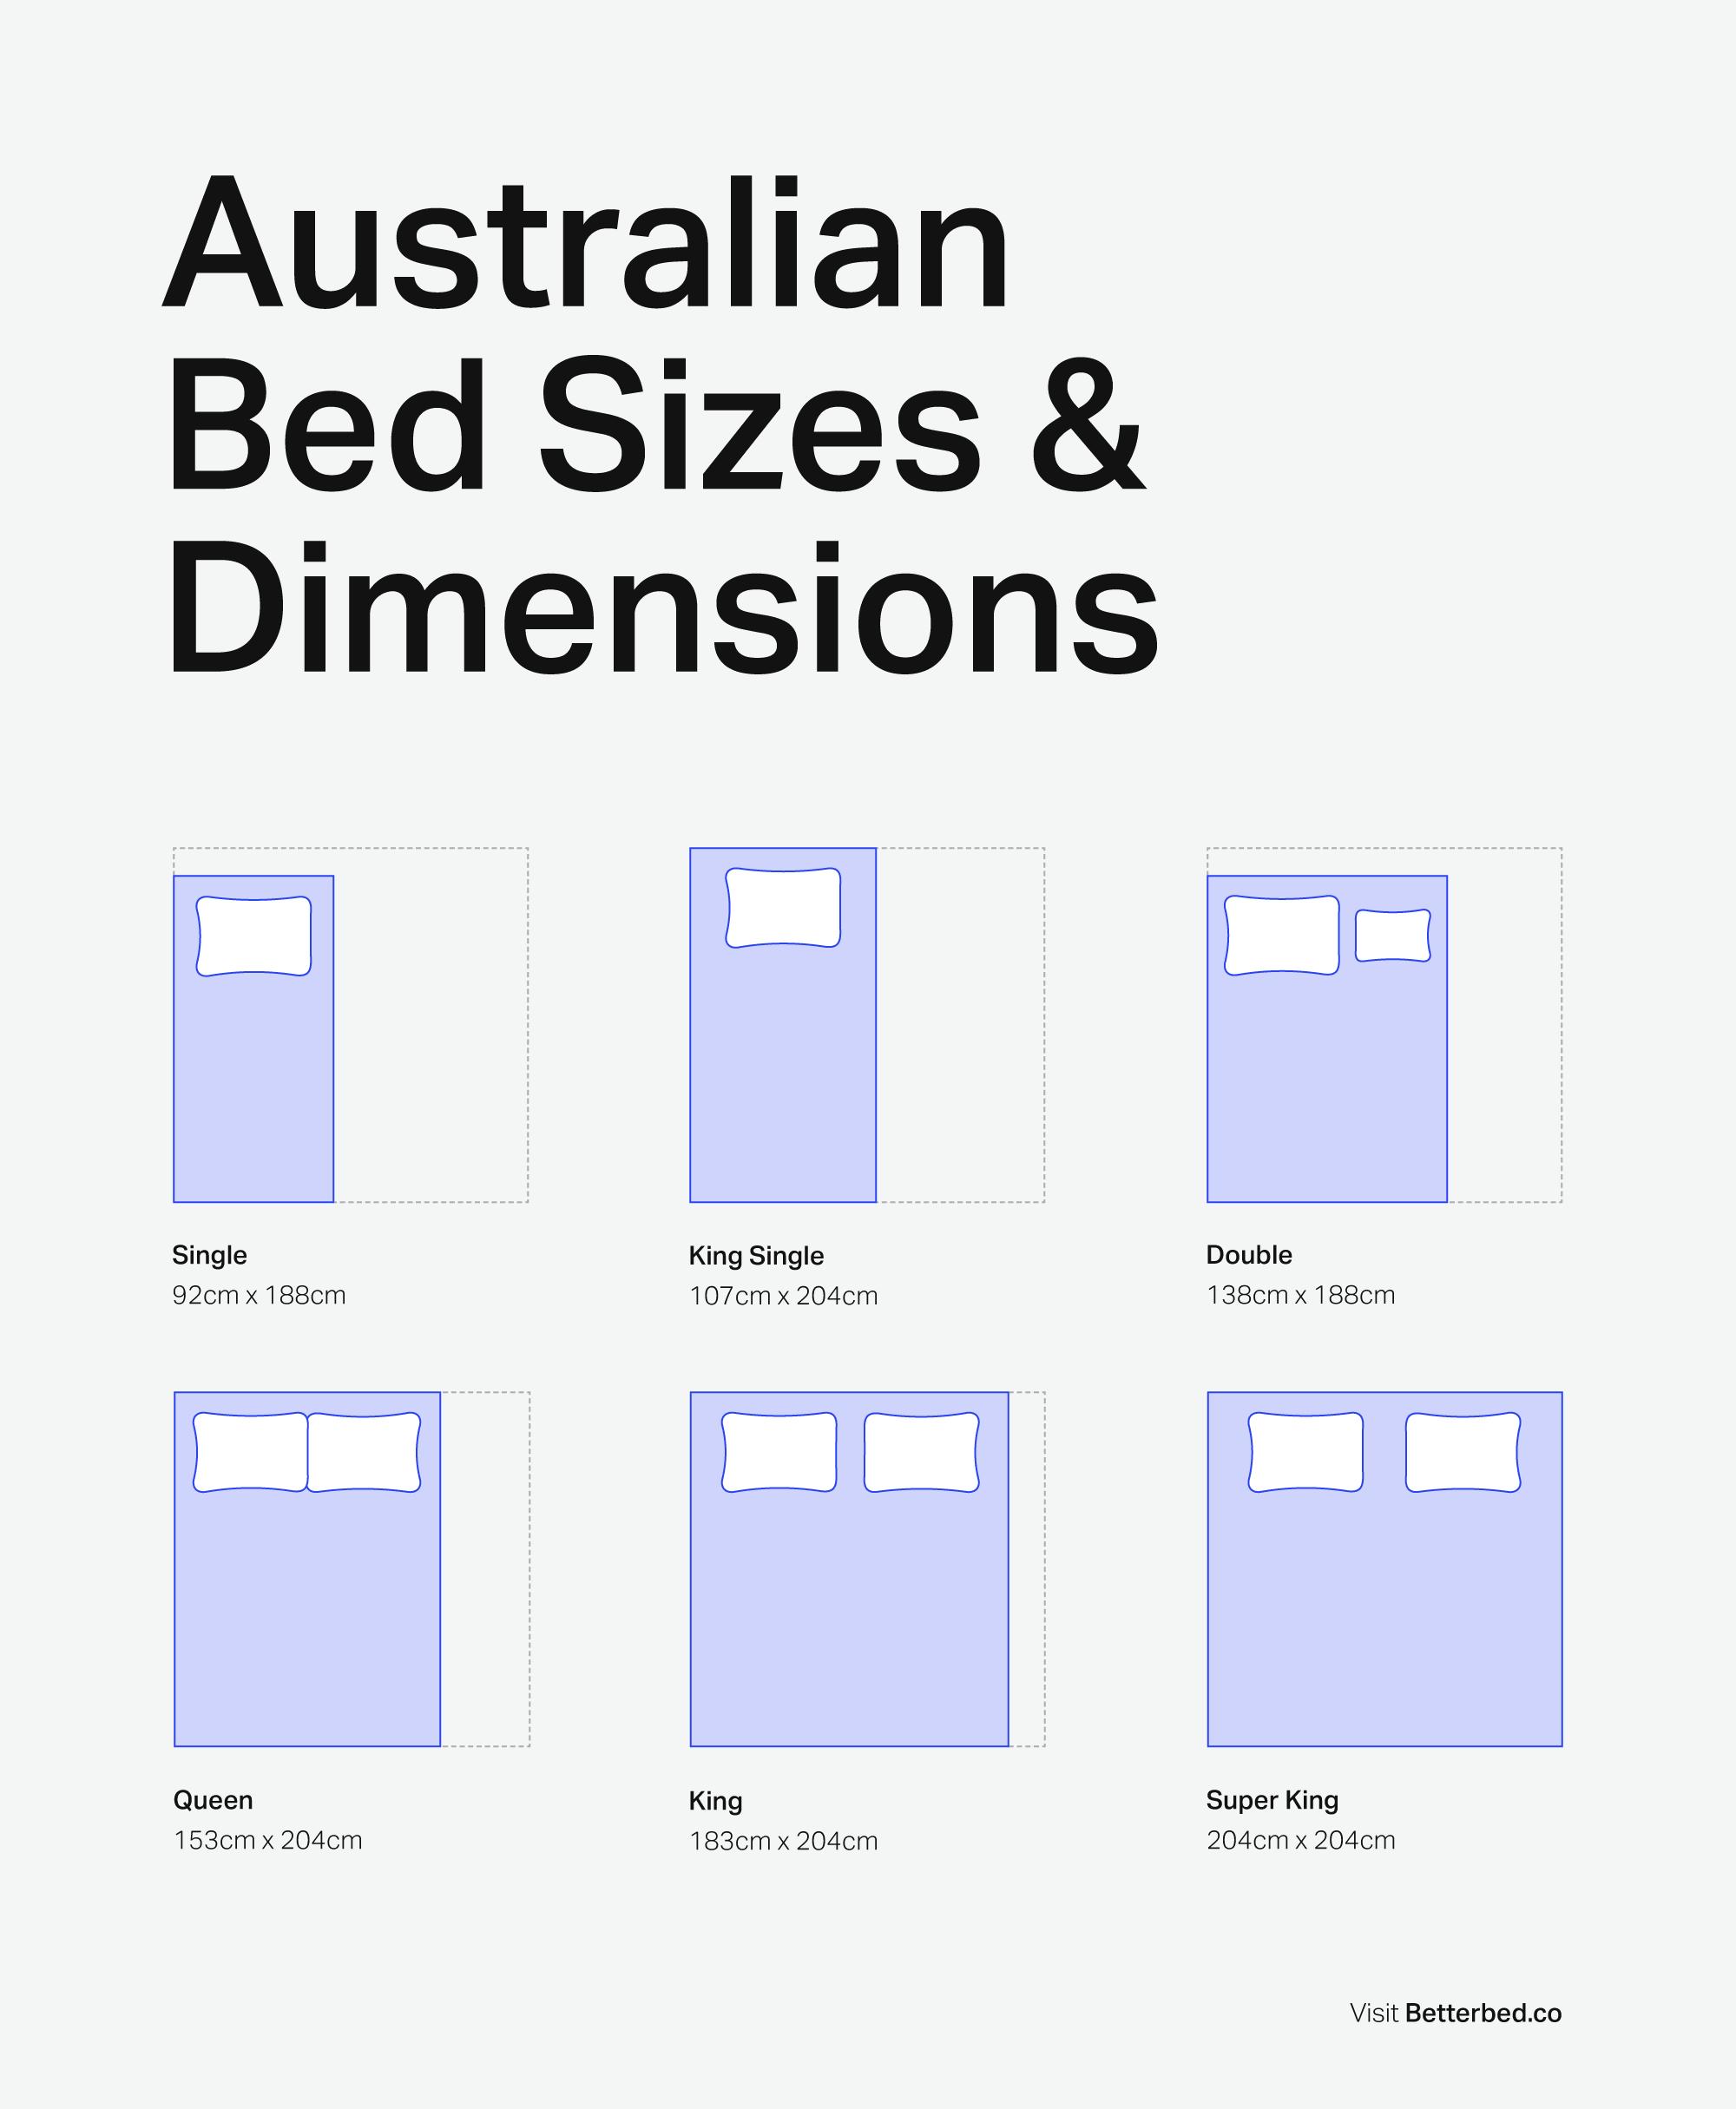 Australian Bed sizes